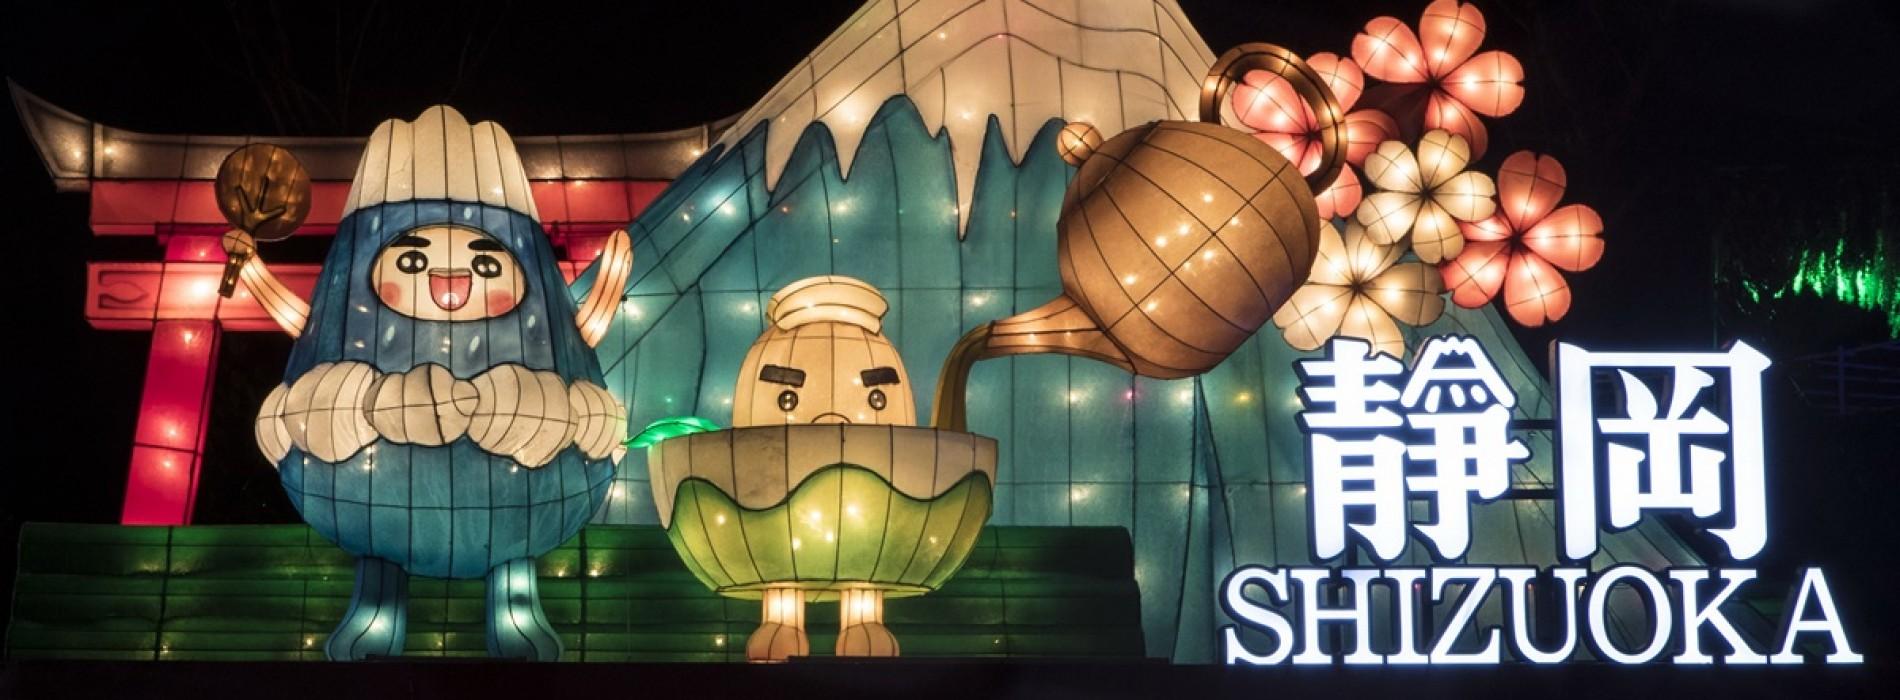 Taiwan celebrates its famous Lantern Festival